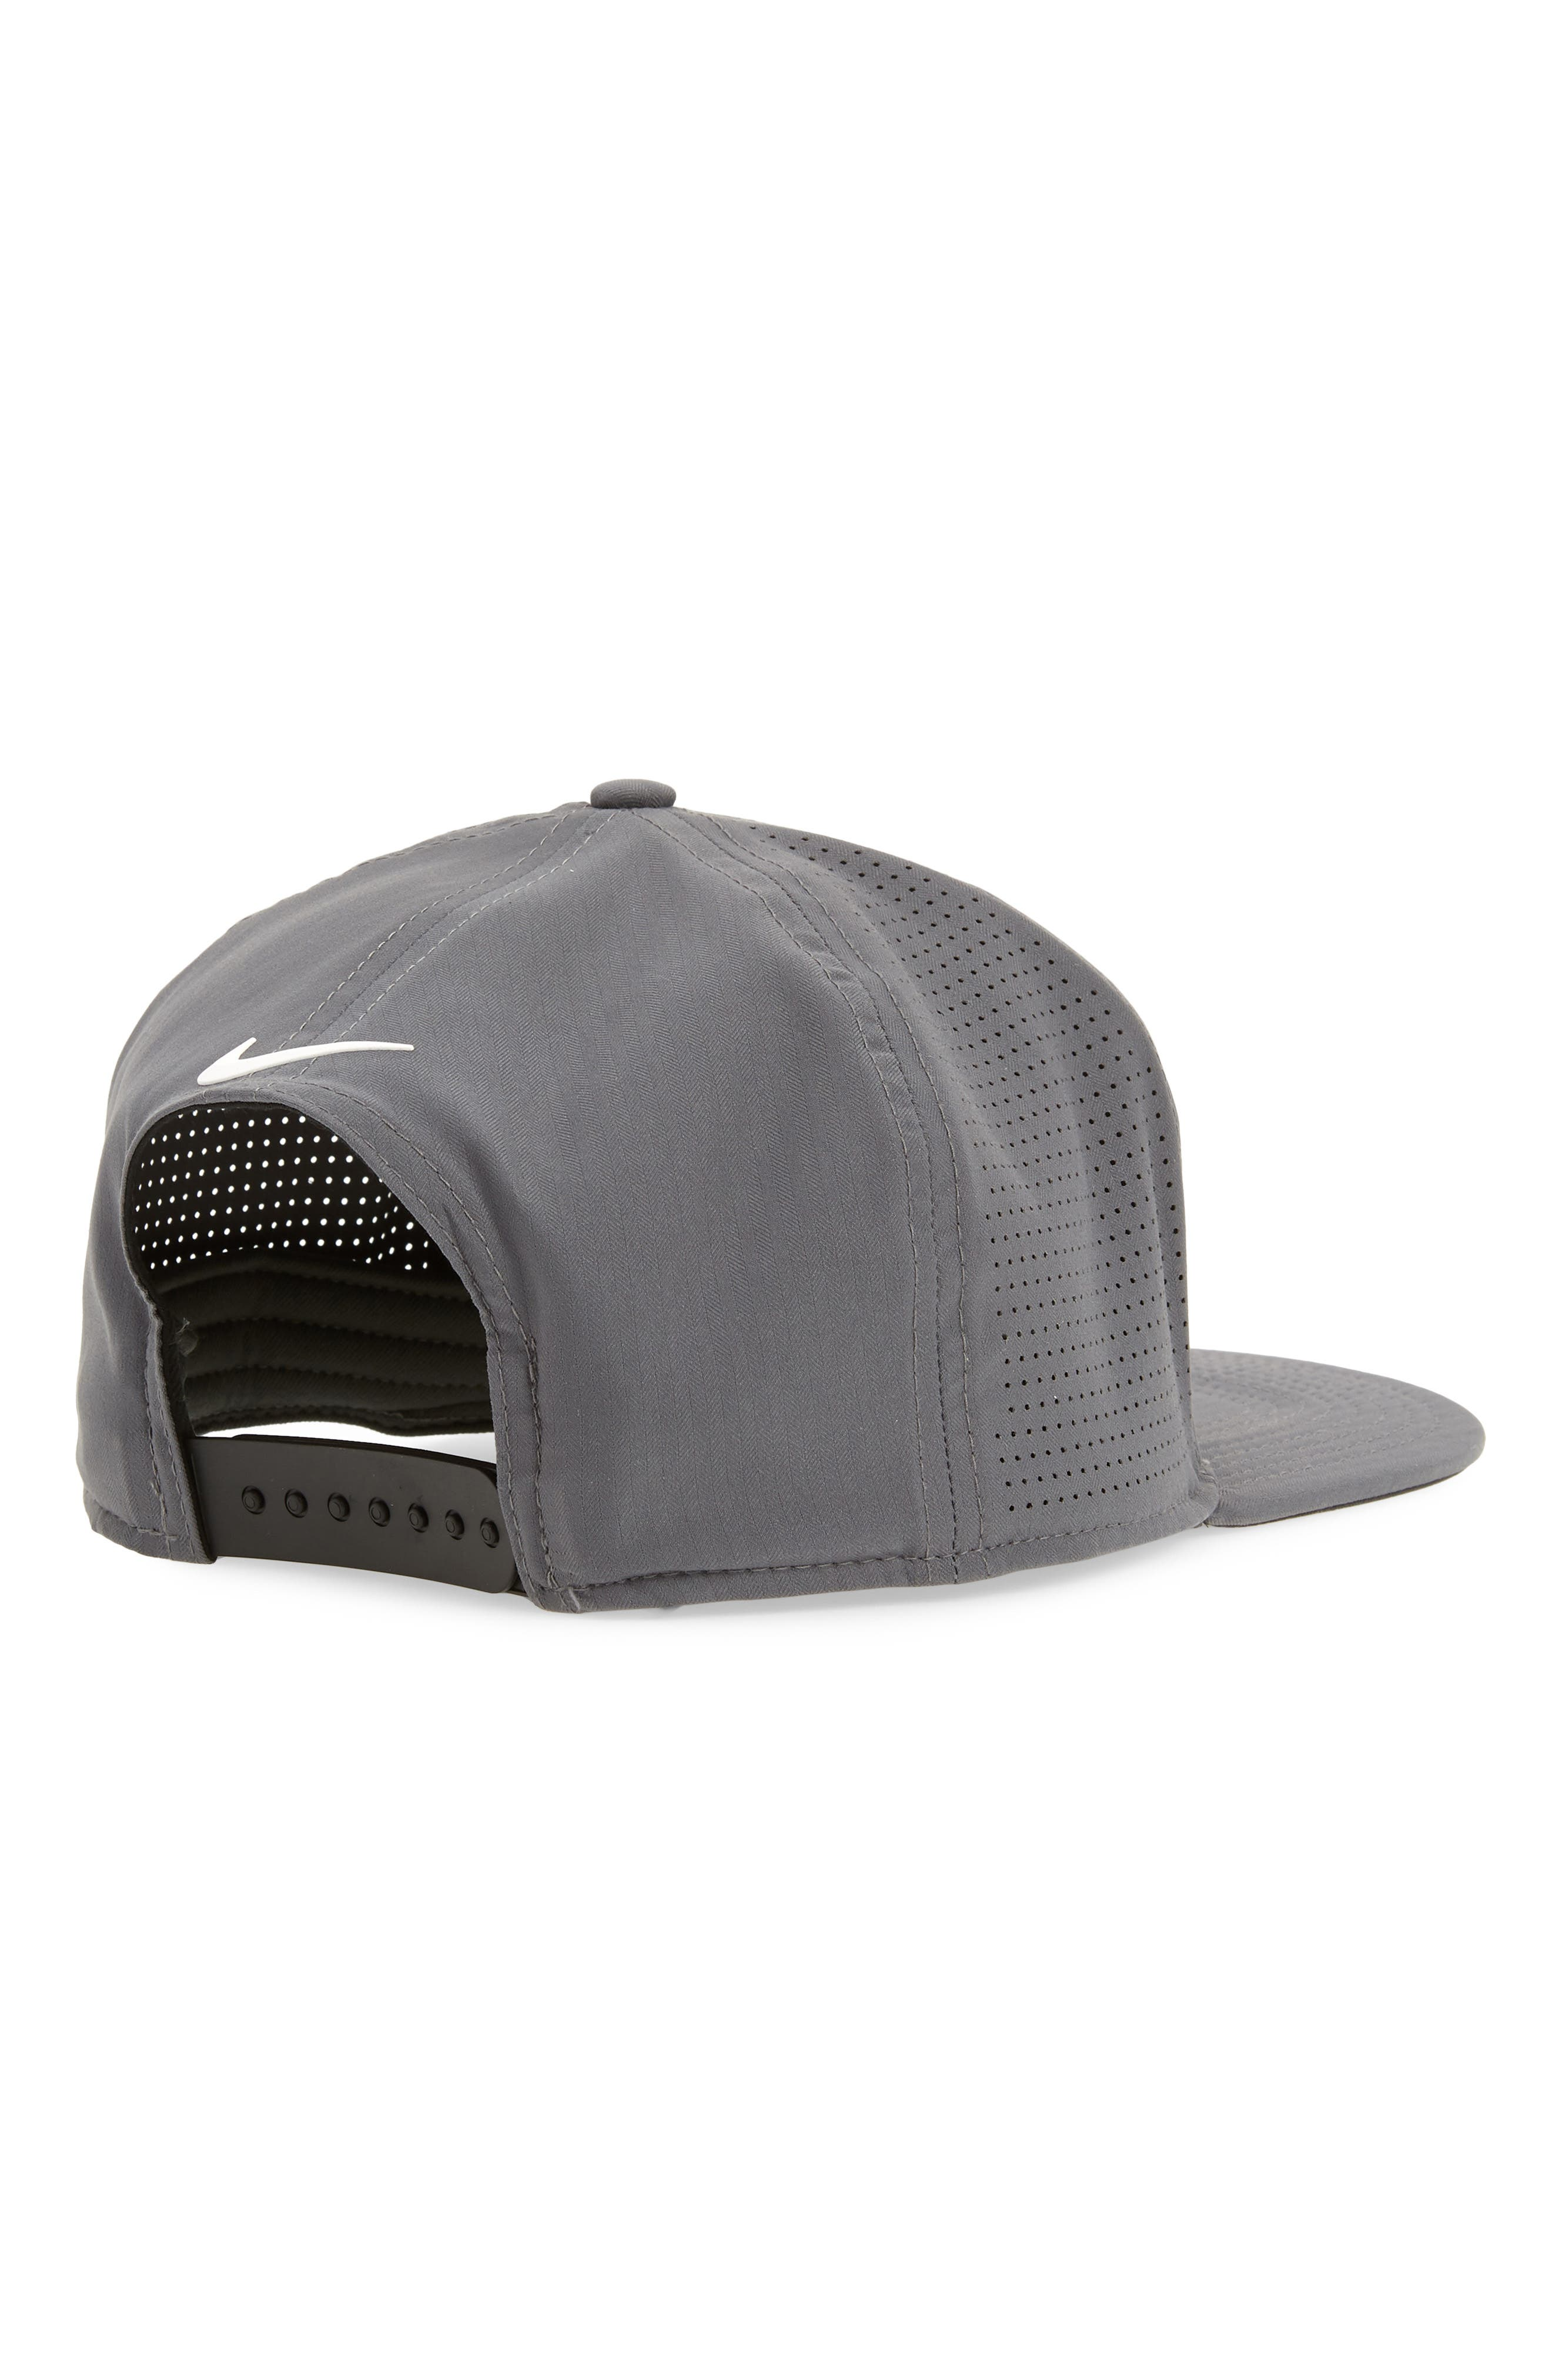 AeroBill Dry Golf Hat,                             Alternate thumbnail 2, color,                             Dark Grey/ Anthracite/ White